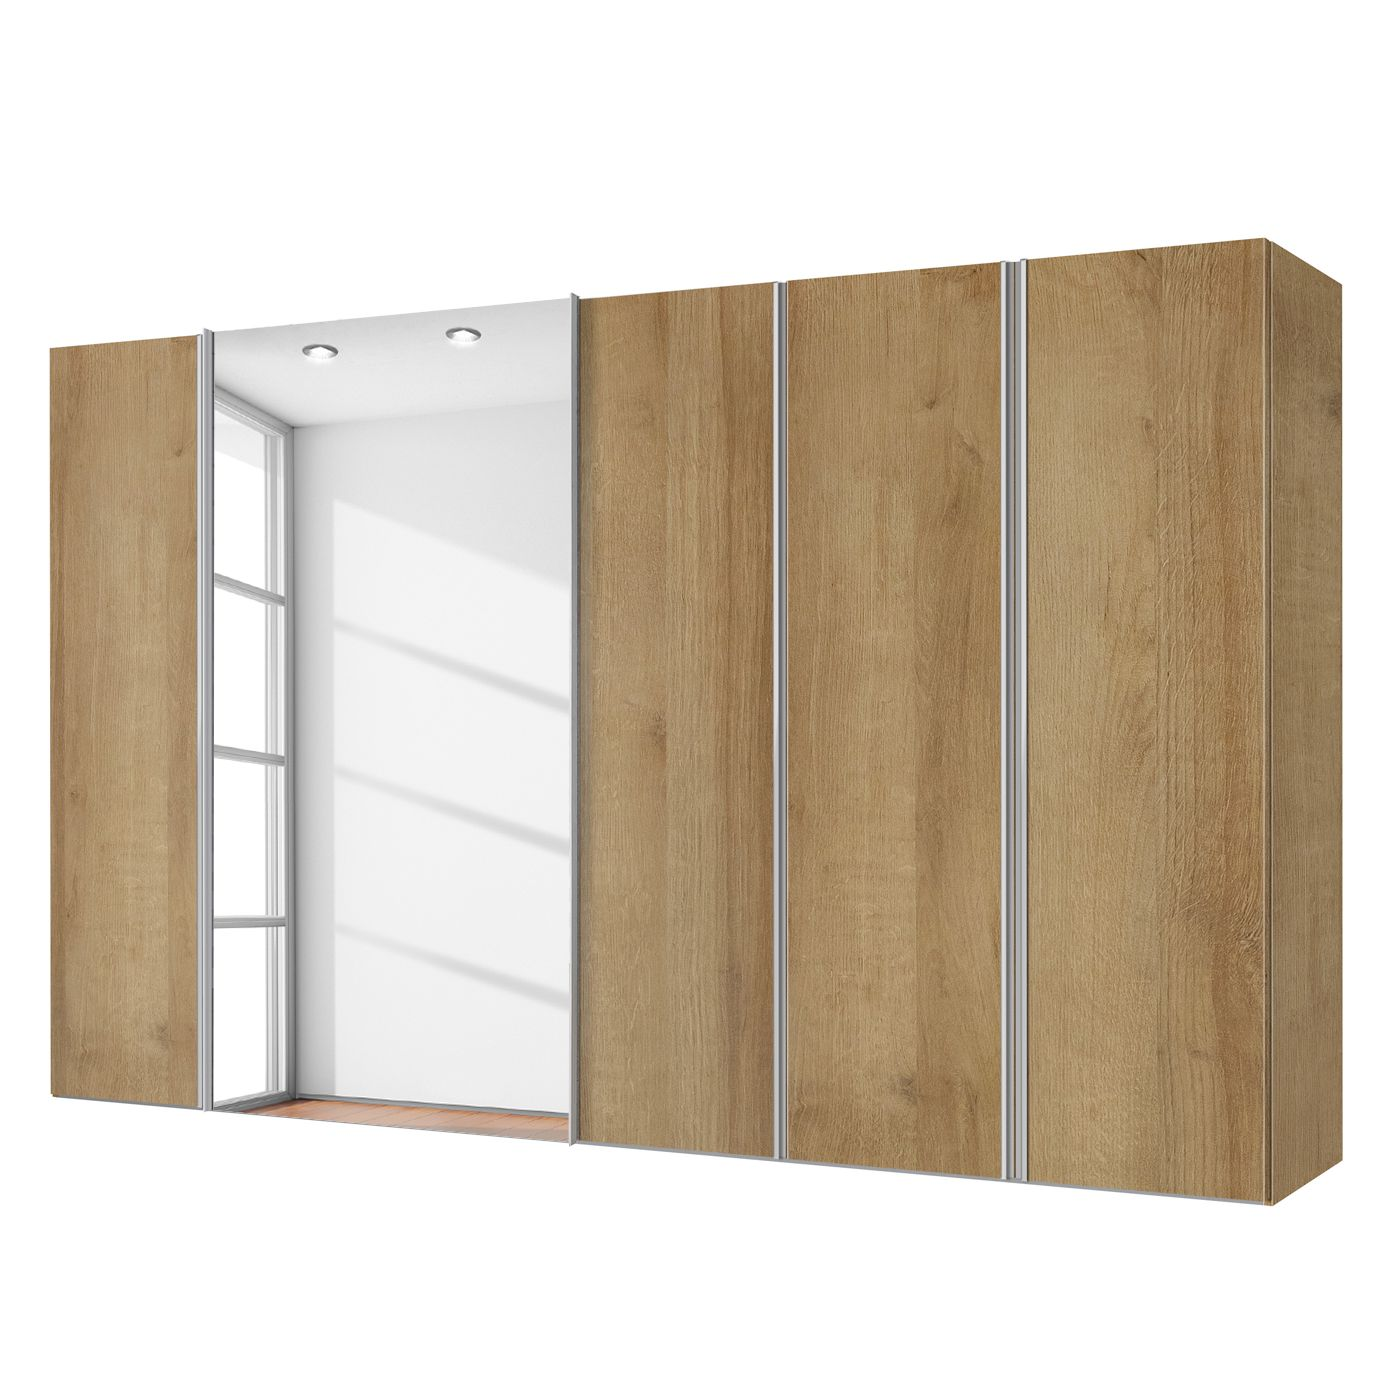 Combikast Hayfork - Riviera eikenhouten look/Spiegelglas - 300cm (5-deurs), Express Möbel